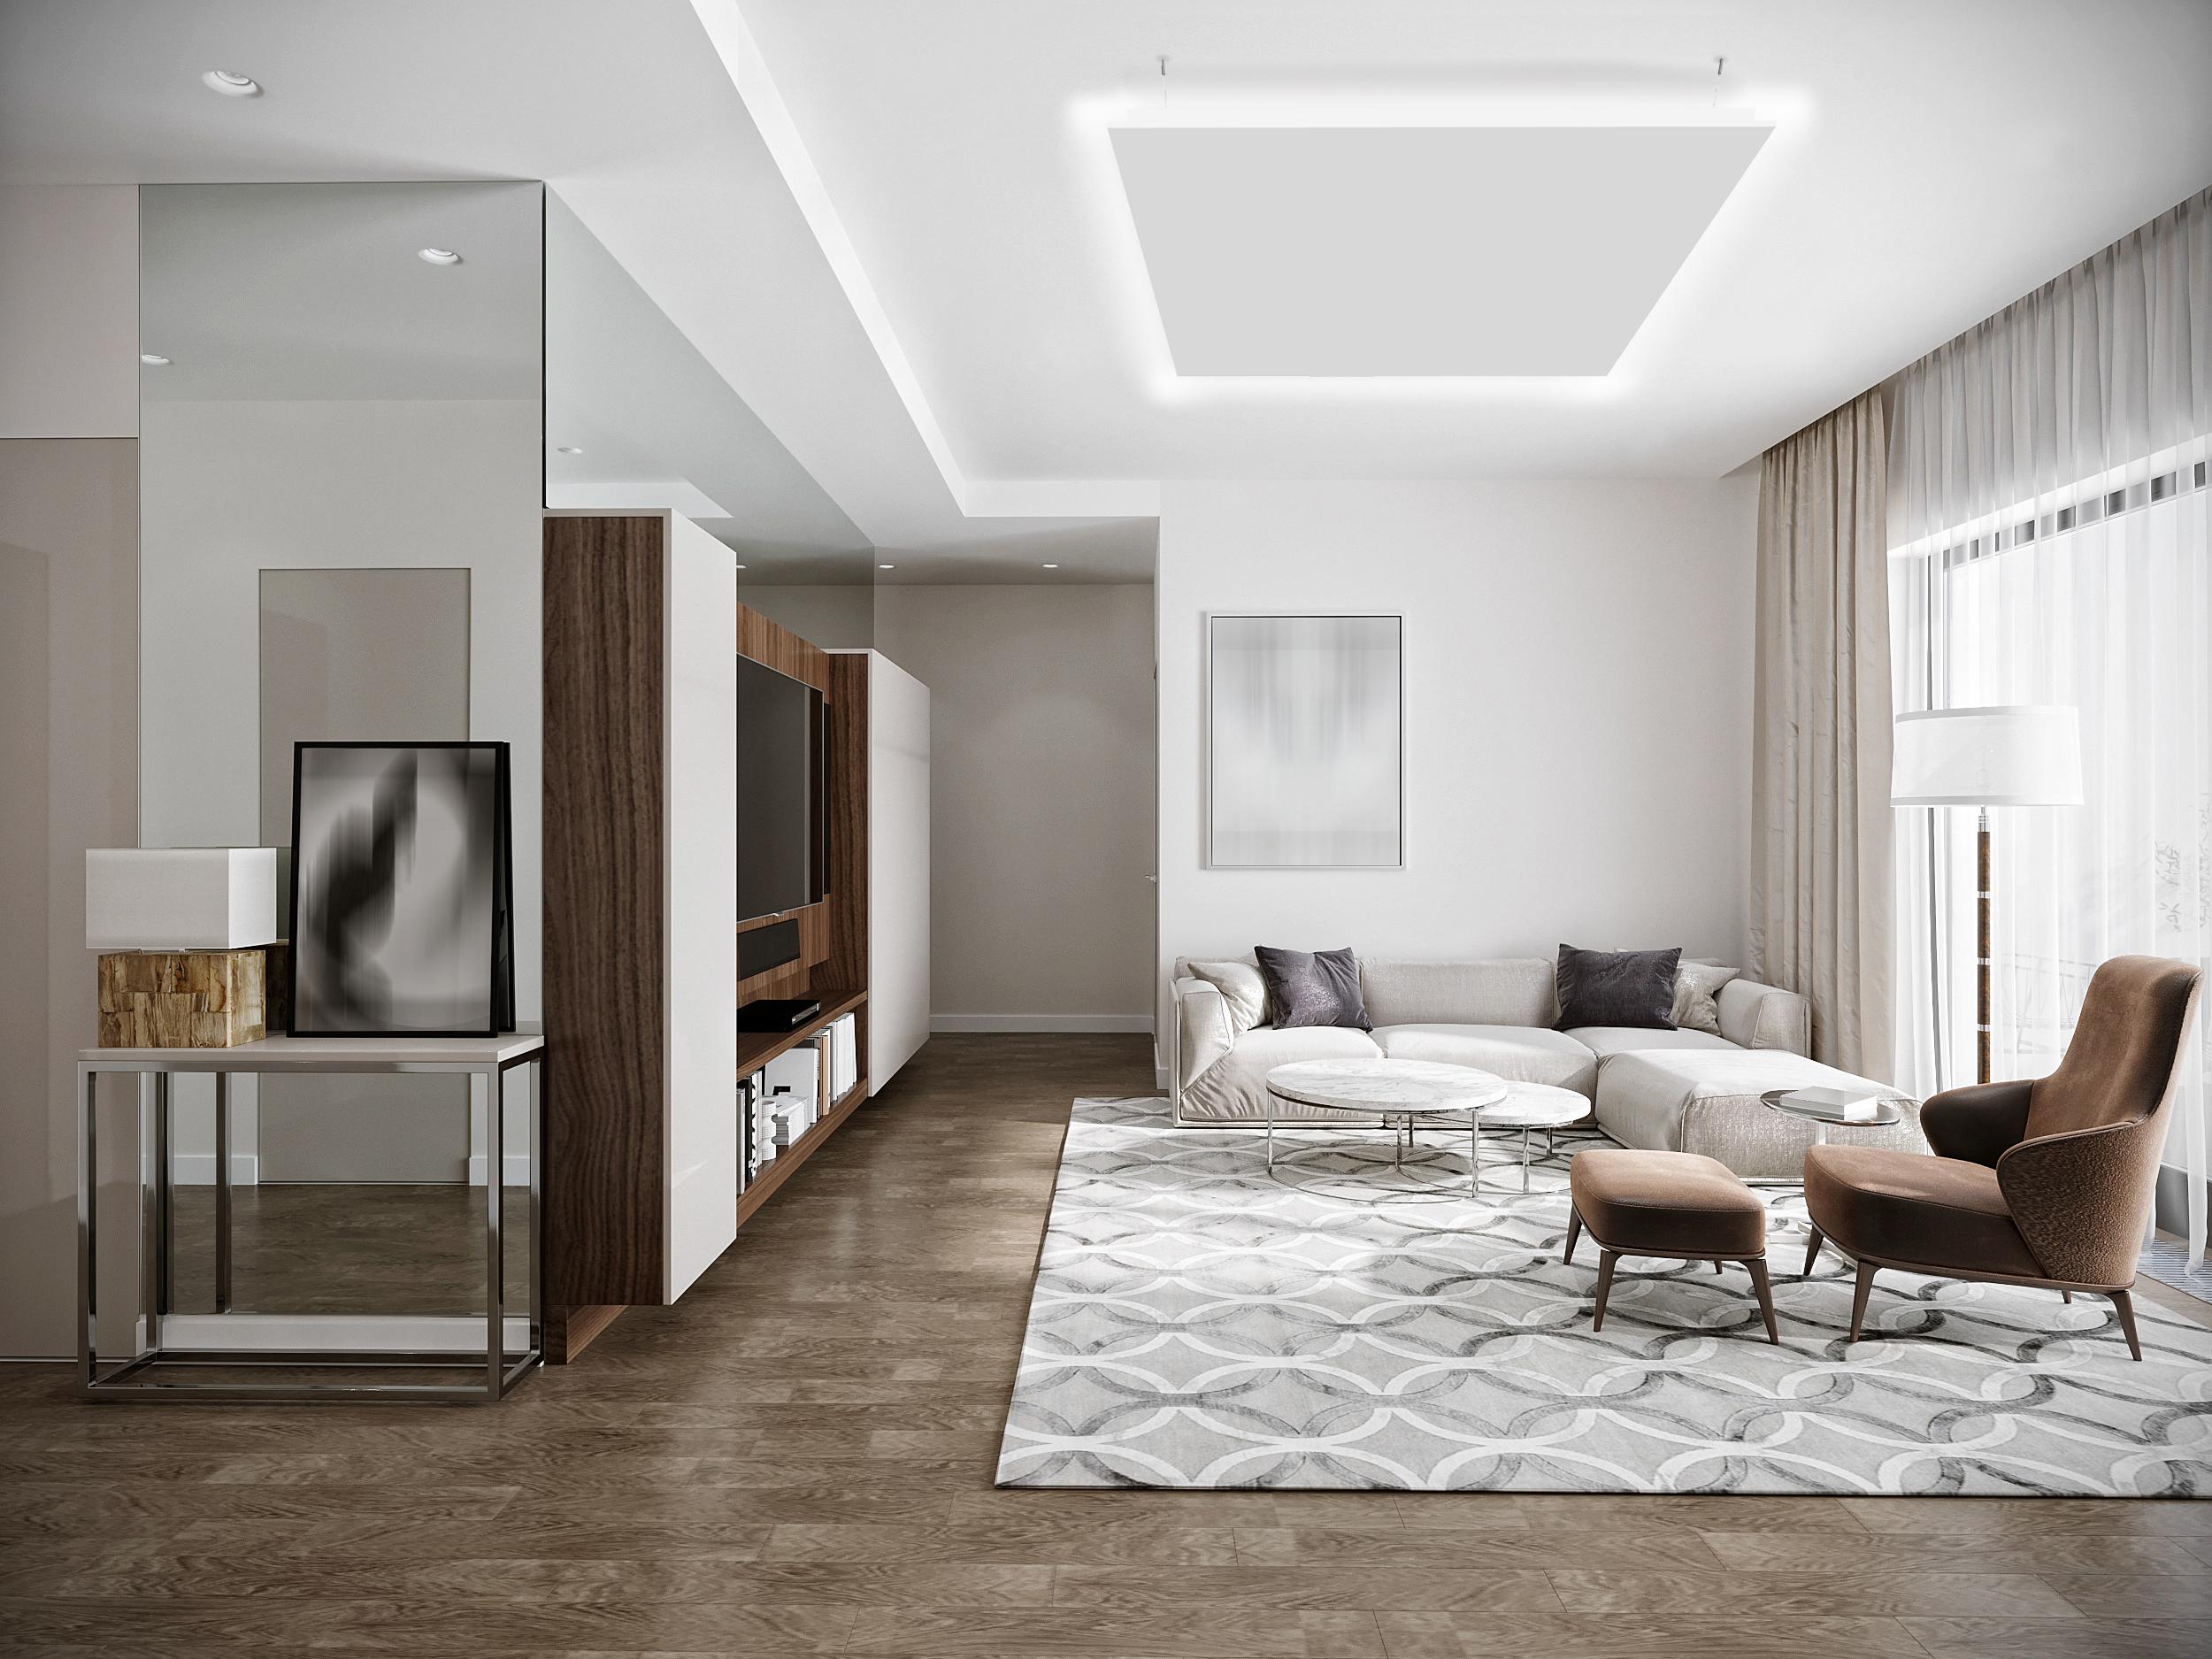 Lampe Plafond Salon Design plafonnier evolution - staff decor